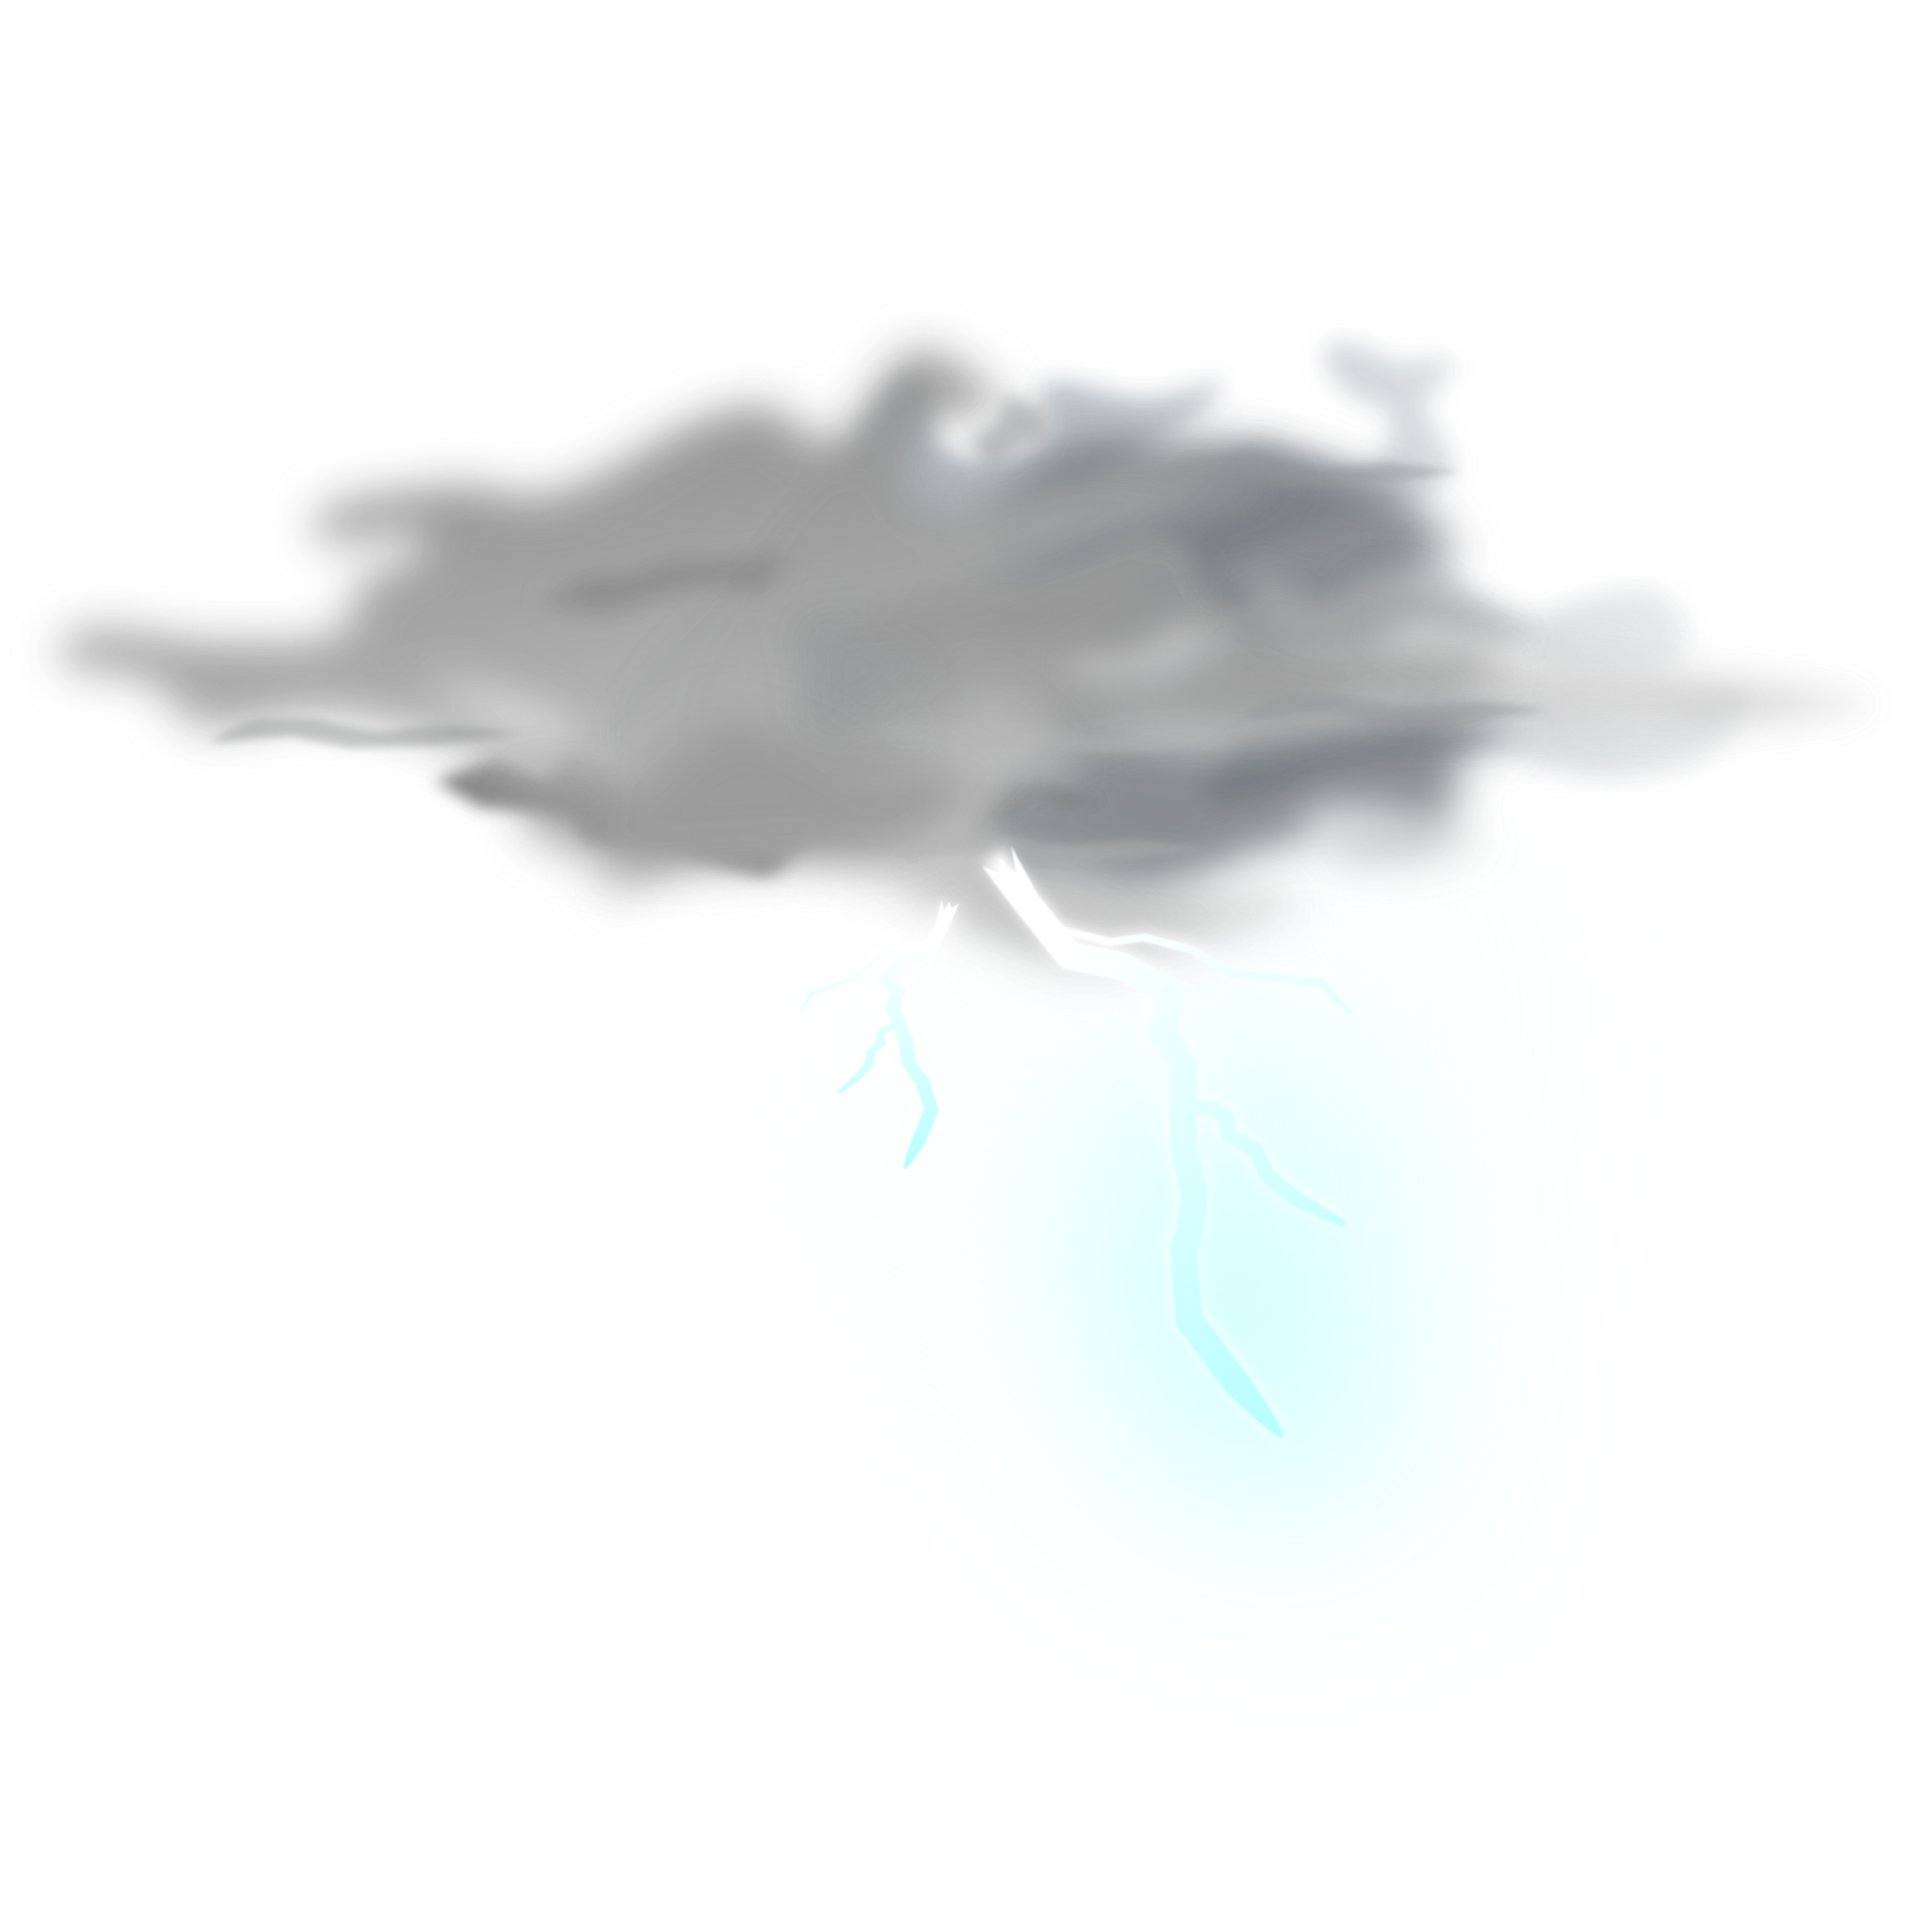 Big Image (Png) - Thunder, Transparent background PNG HD thumbnail